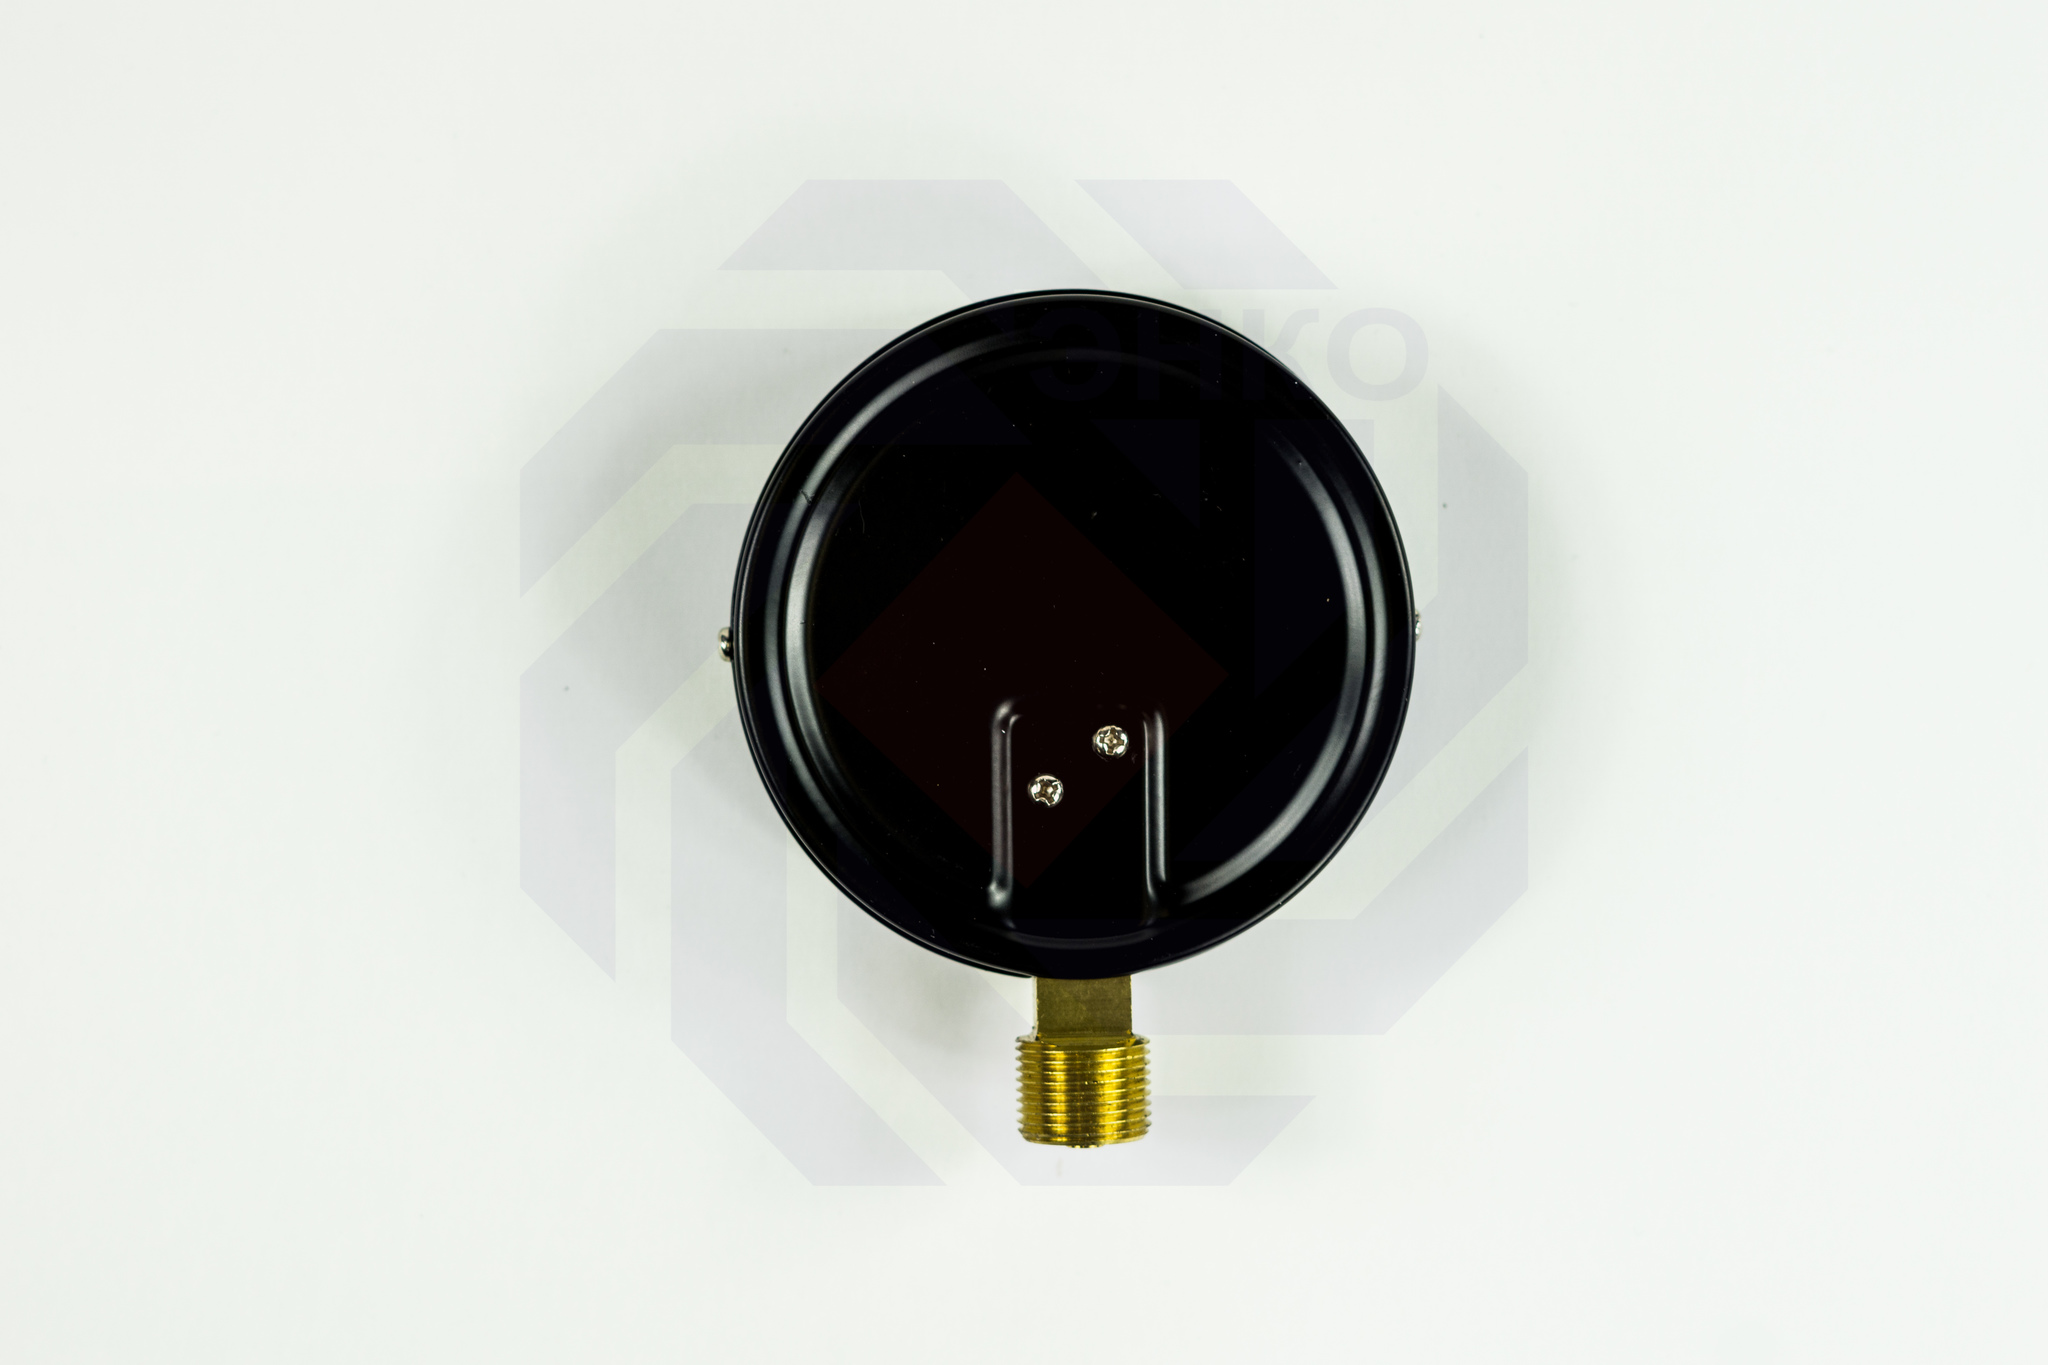 Манометр радиальный ЮМАС МП100М 0-1,6 МПа 100 мм M20⨯1,5